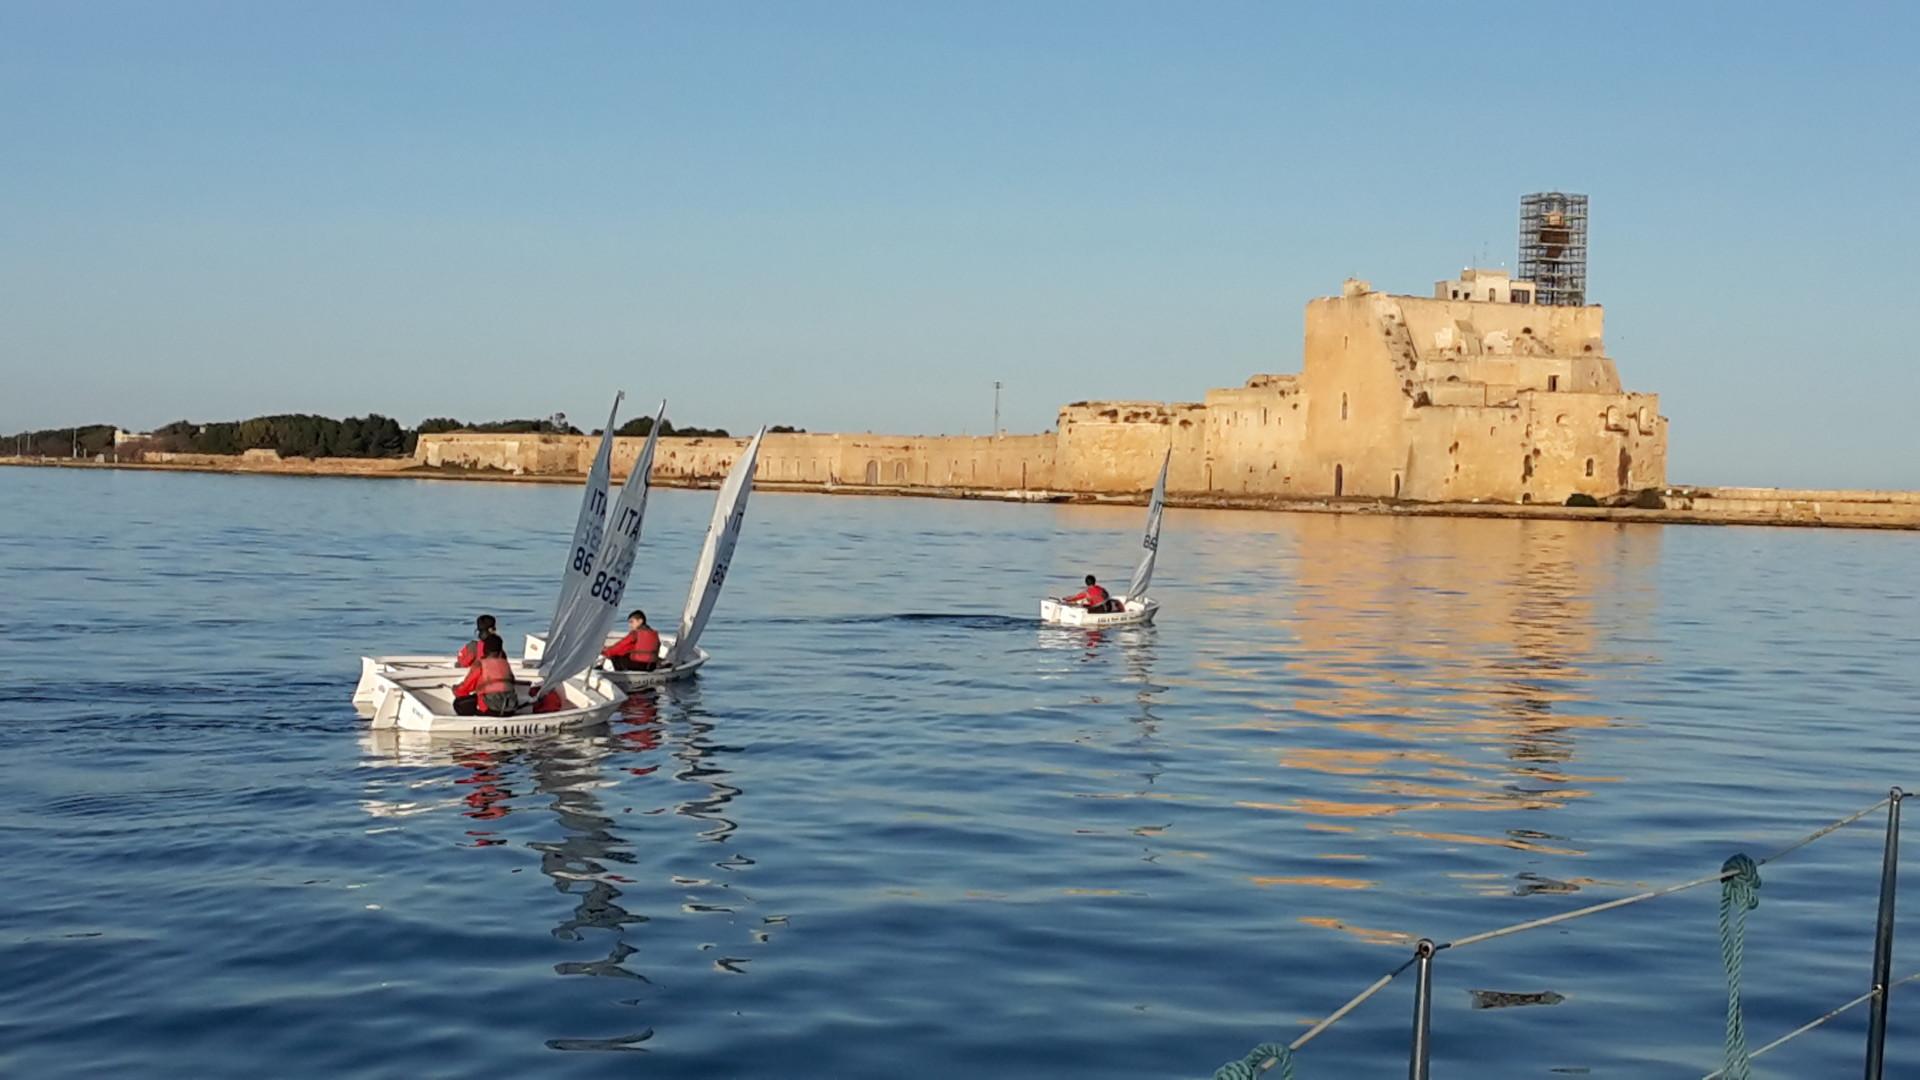 Scuola-di-vela-lega-navale-LNI-Brindisi (6)